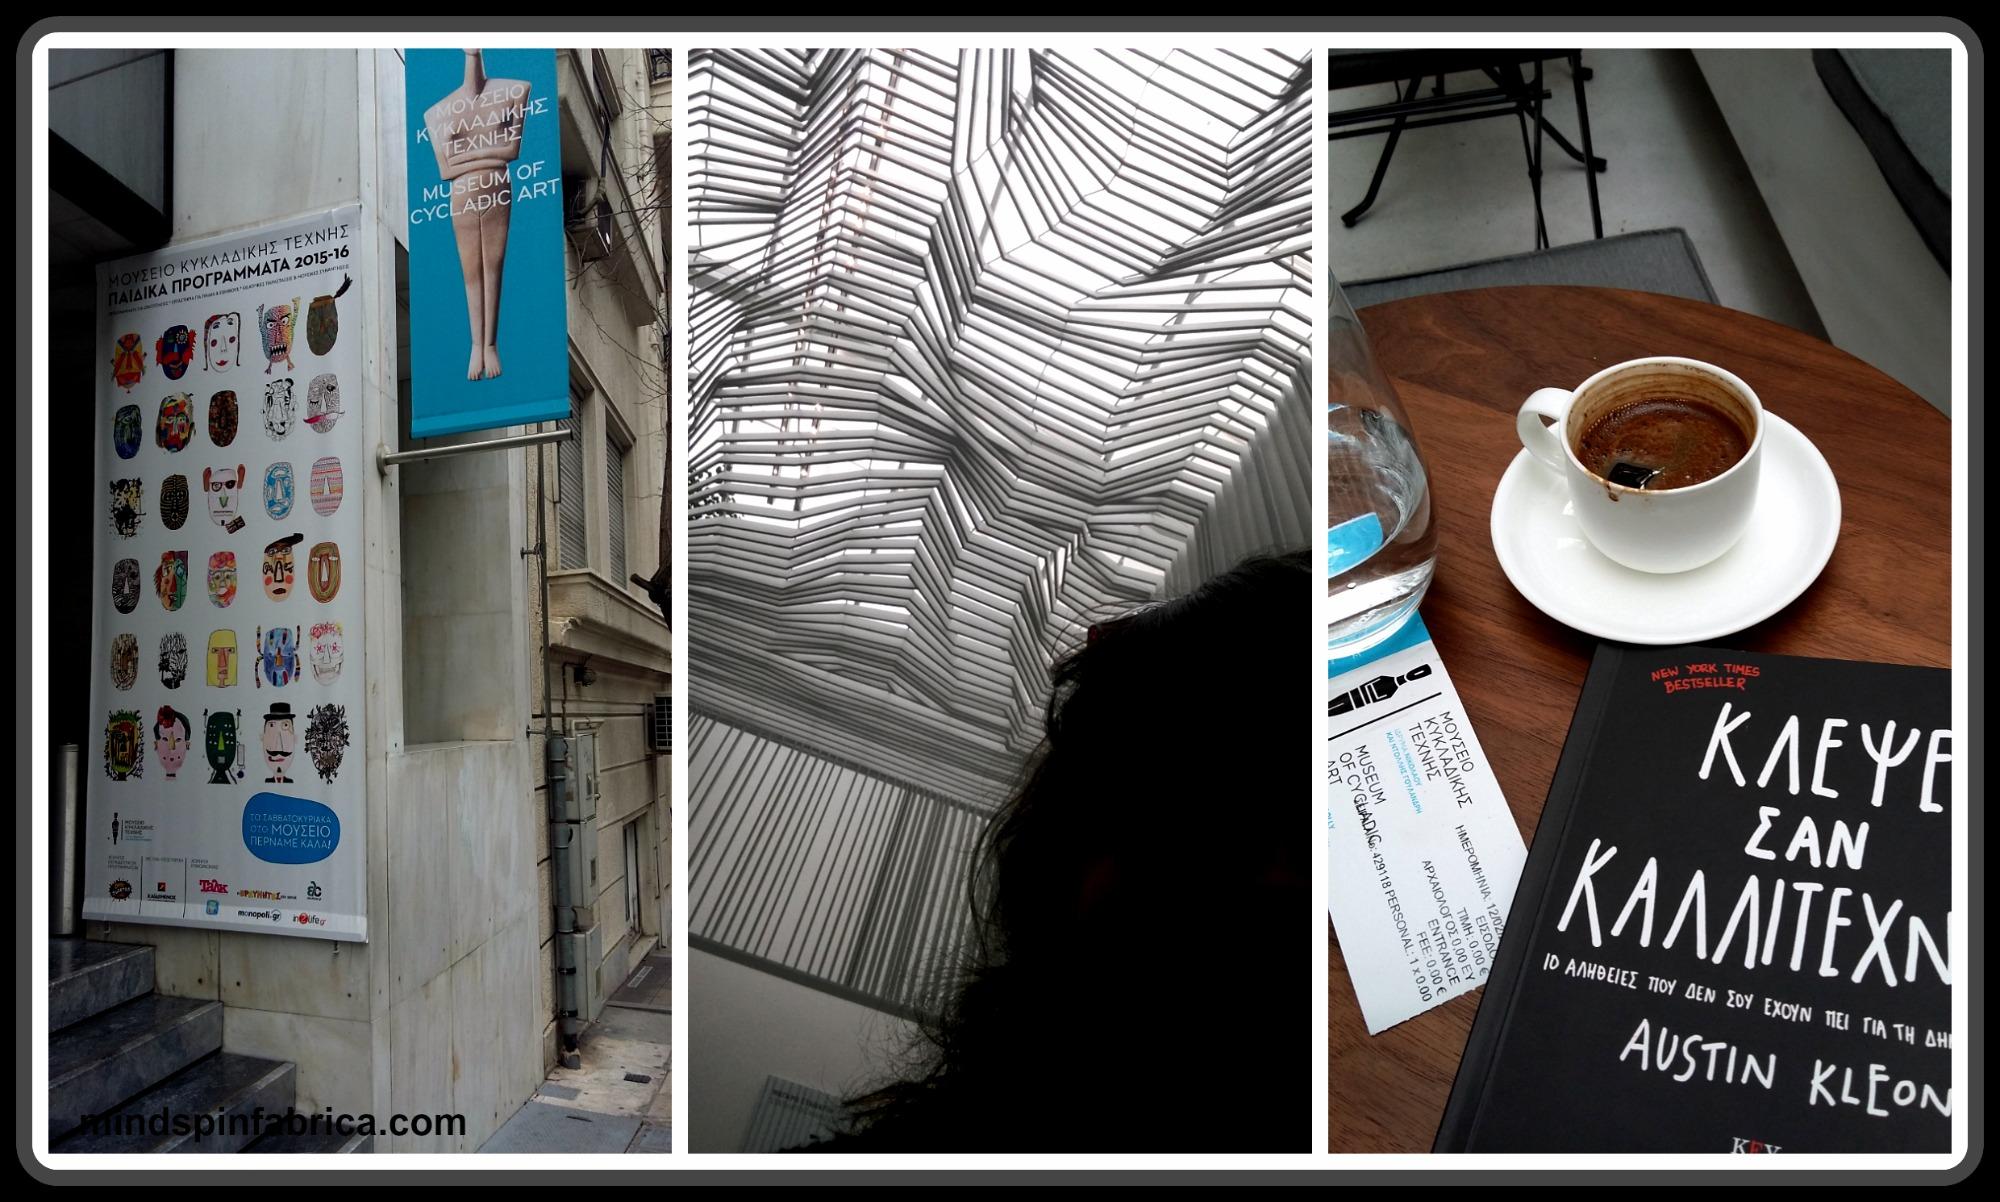 mindspinfabrica.com_Cycladic Art Museum, Athens